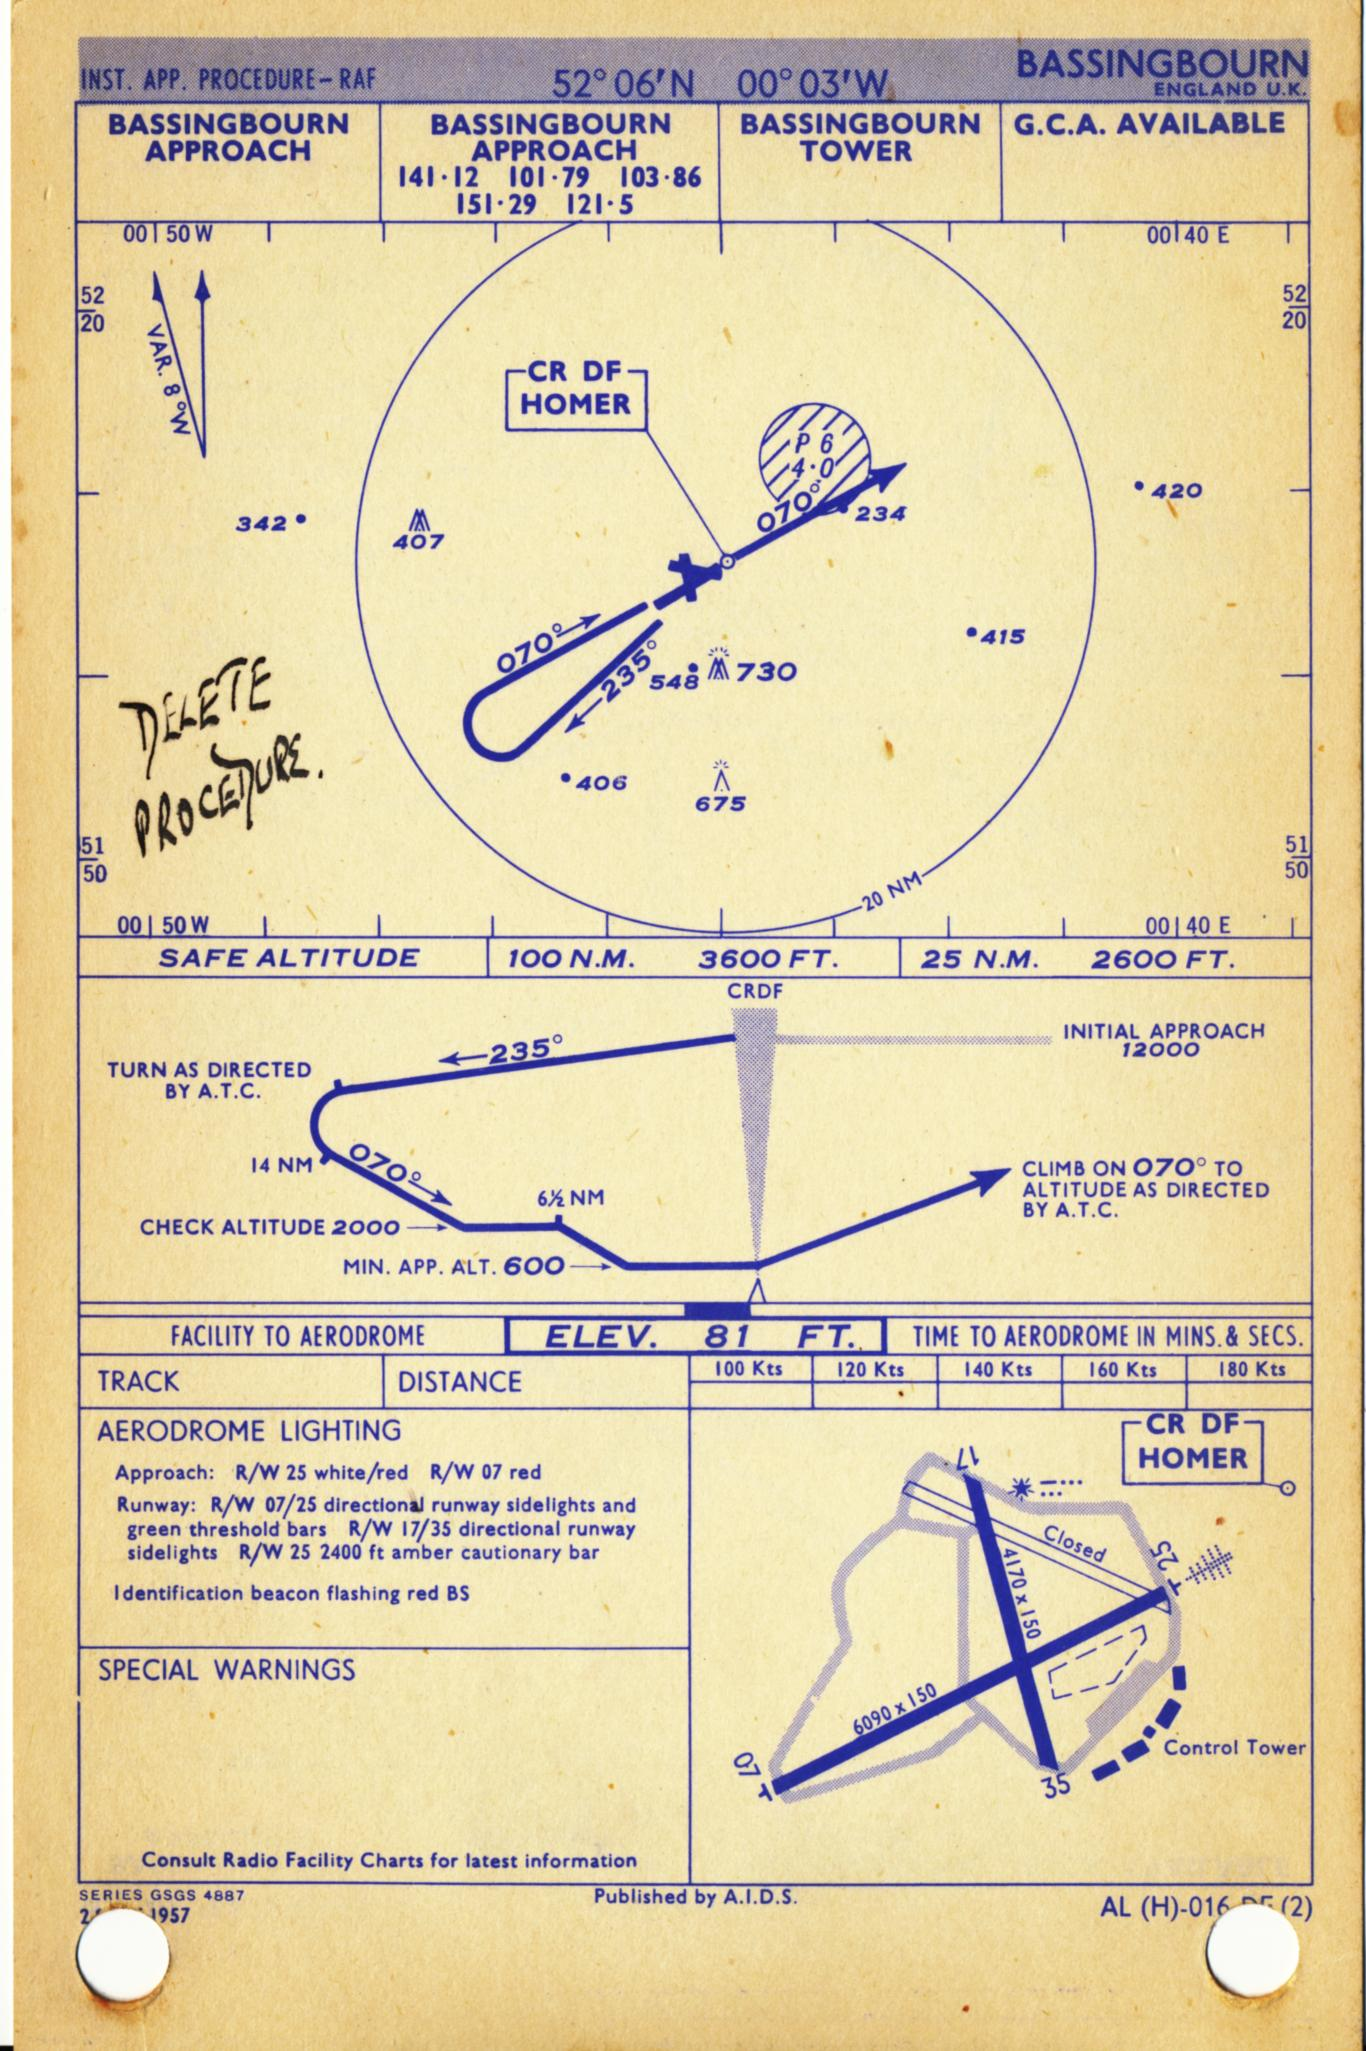 BA Chart 937 Eastern Approaches to Hong Kong